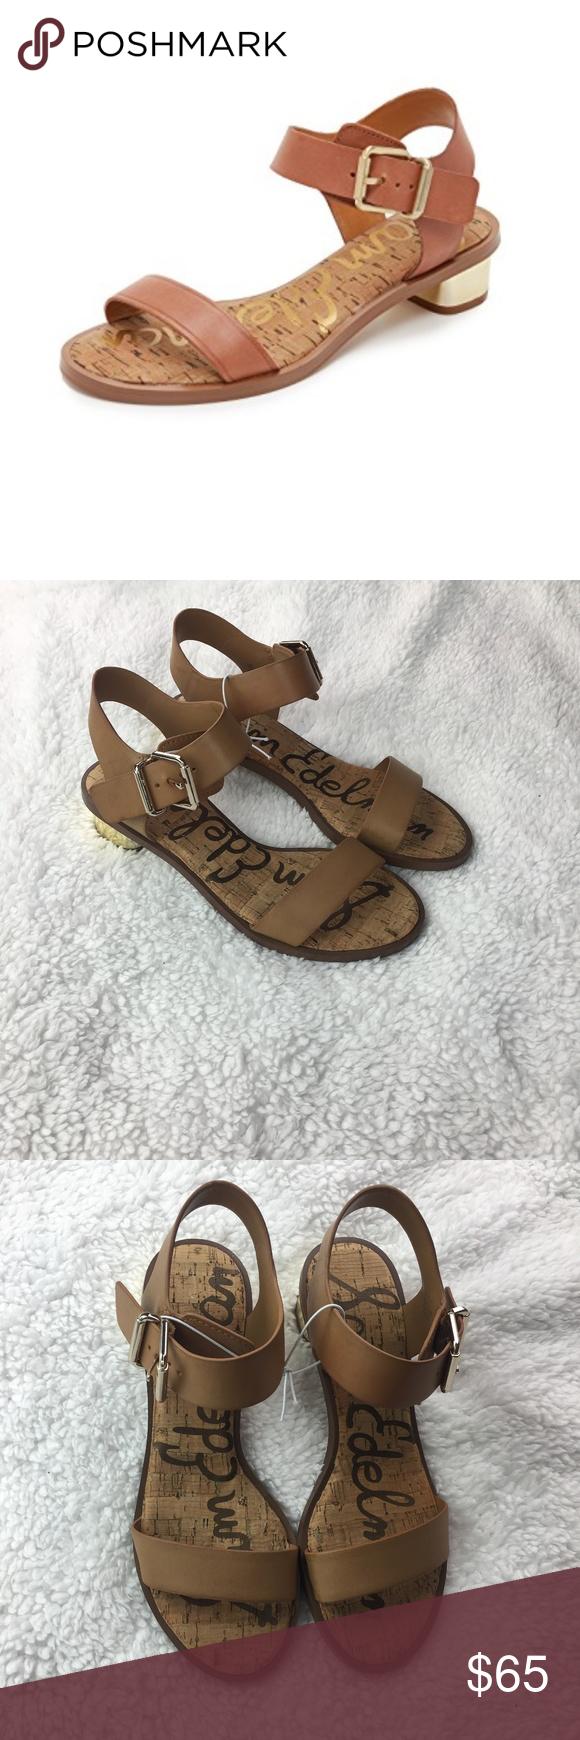 295fc4771c0f Sam Edelman Trixie sandals cognac gold heel Brand New! Sam Edelman Trixie  sandals color  whiskey. Cognac ankle strap sandals with small gold heel ...